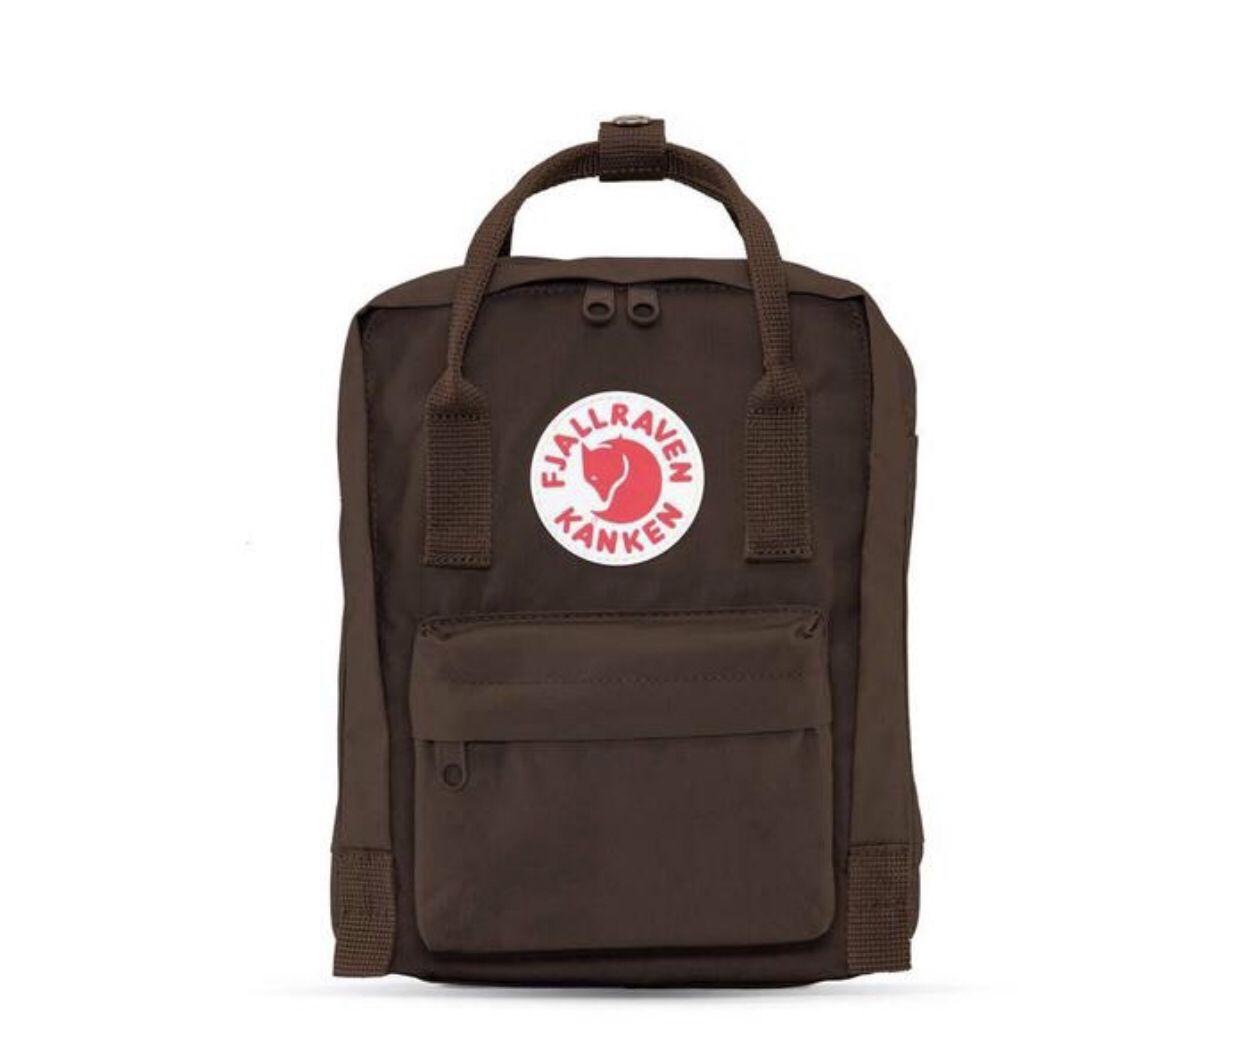 f36791d3008 Kånken Mini Backpack